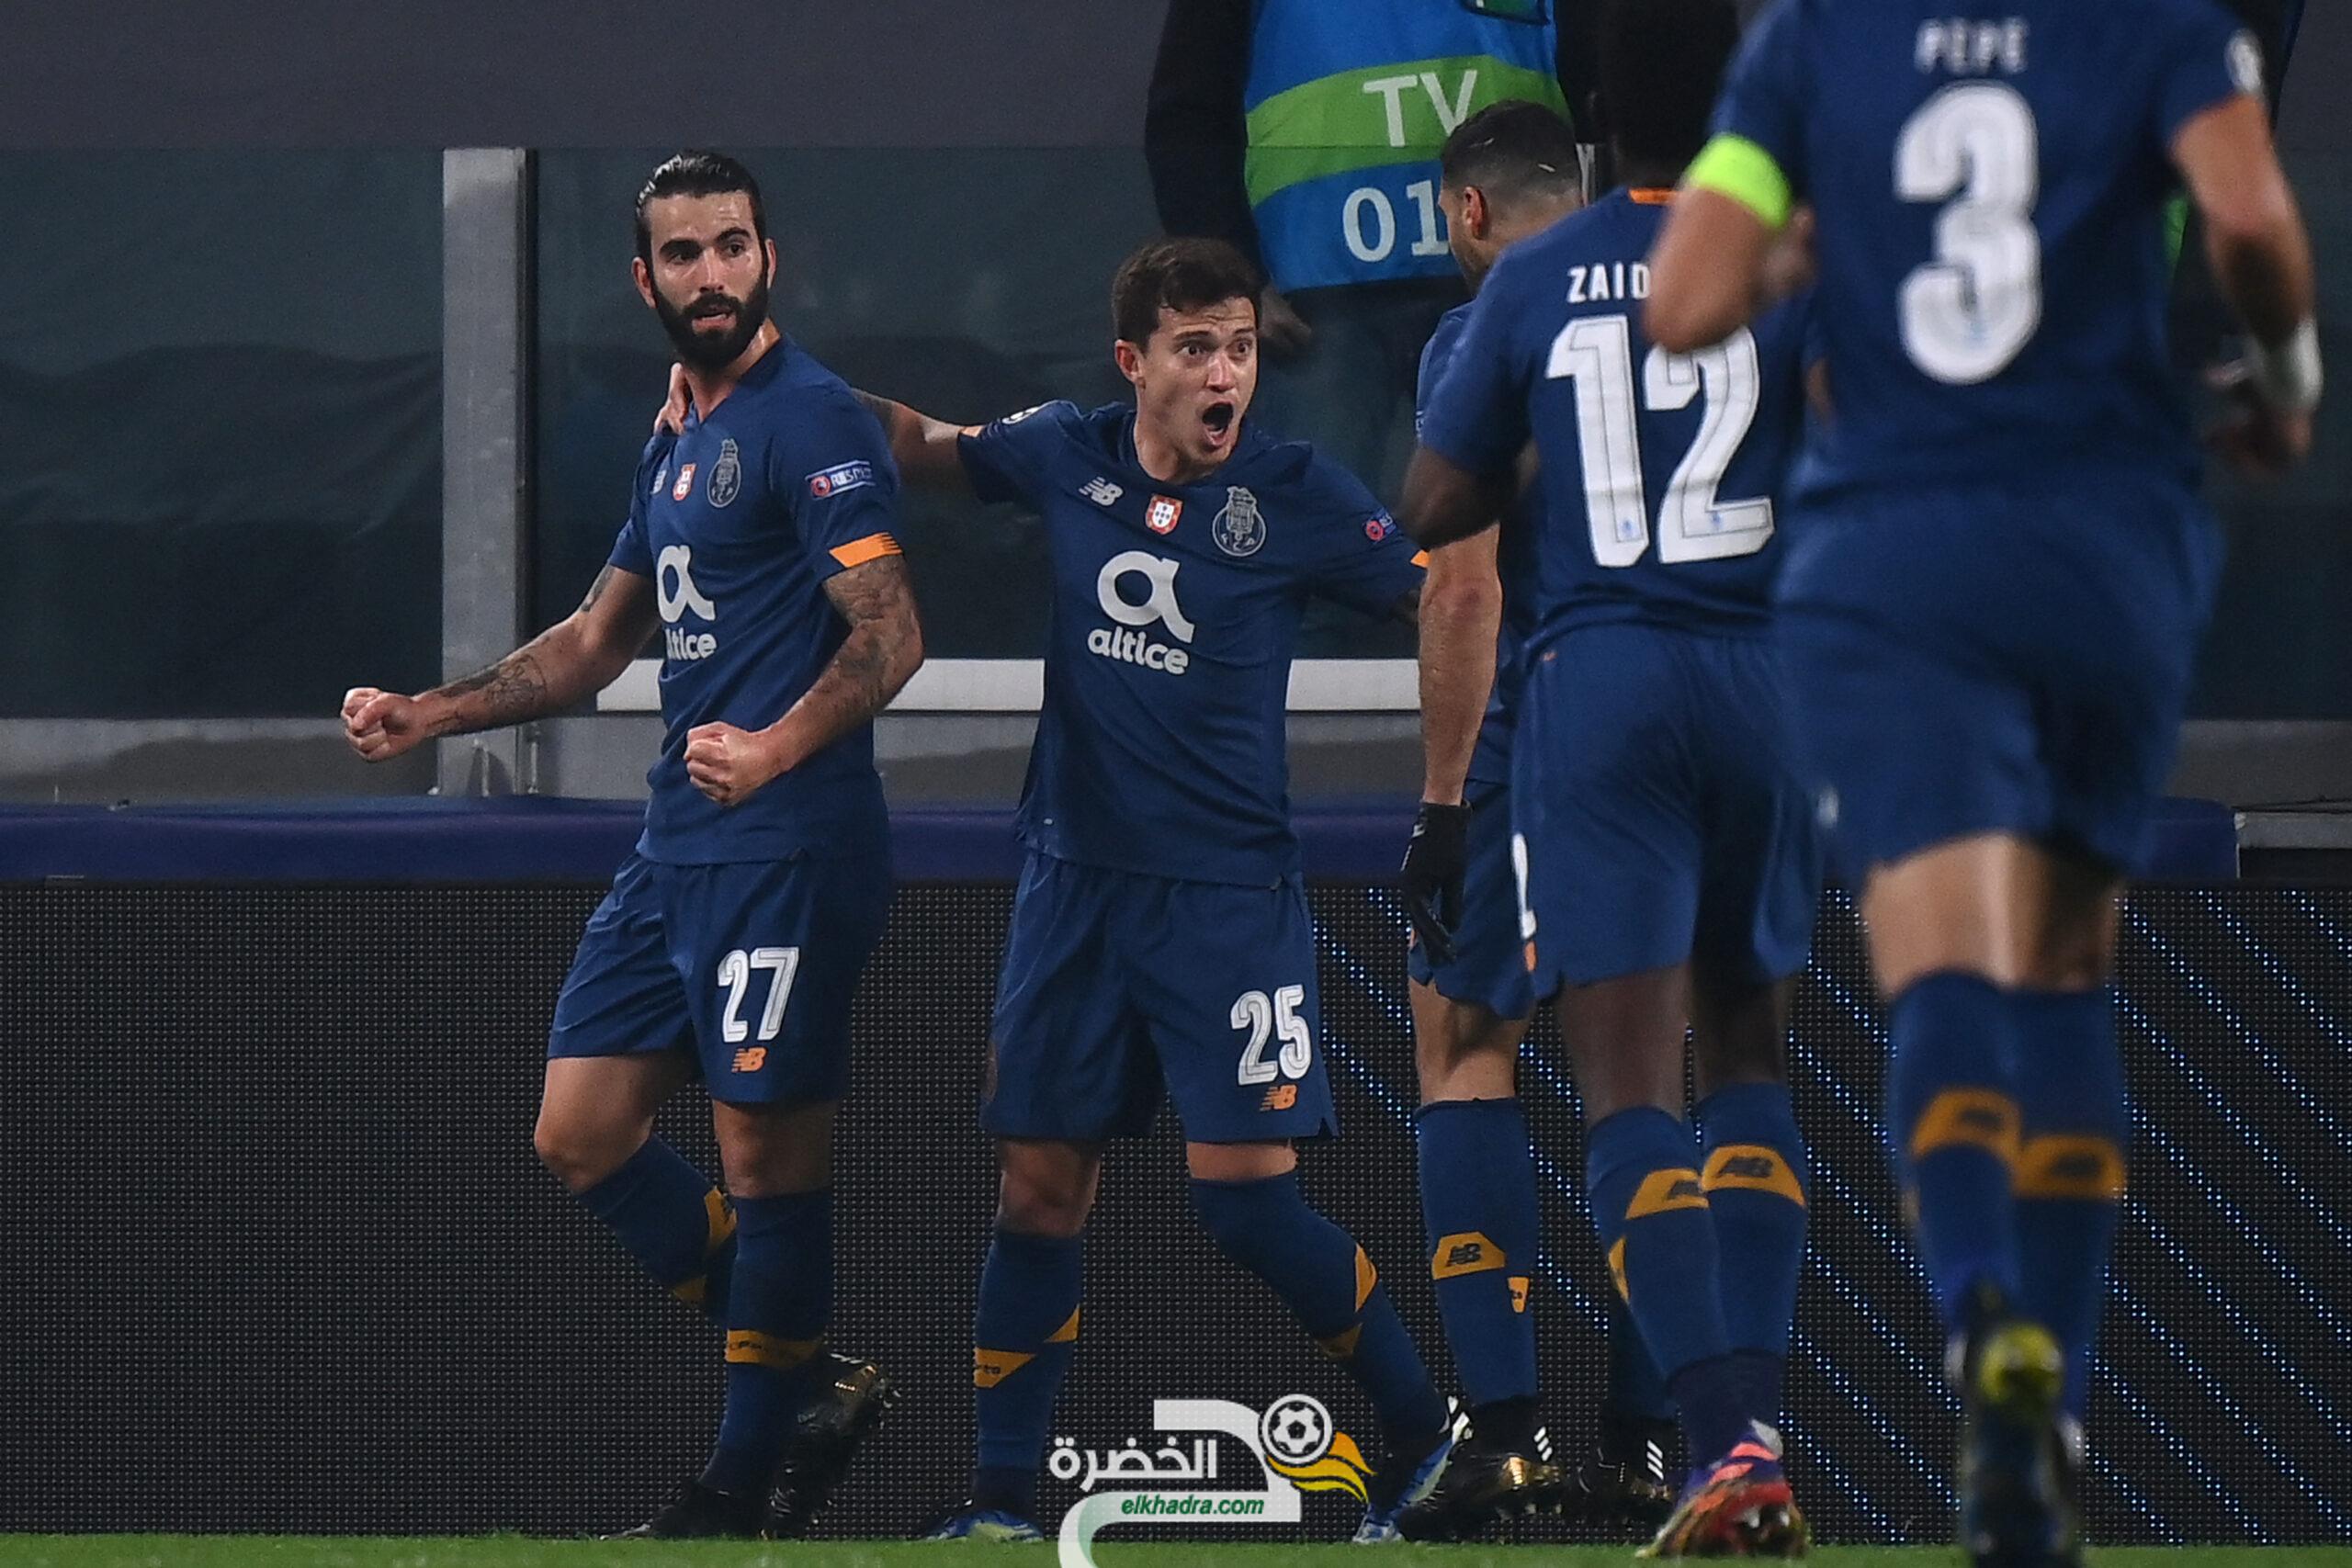 بورتو يبلغ ربع نهائي دوري أبطال أوروبا 23